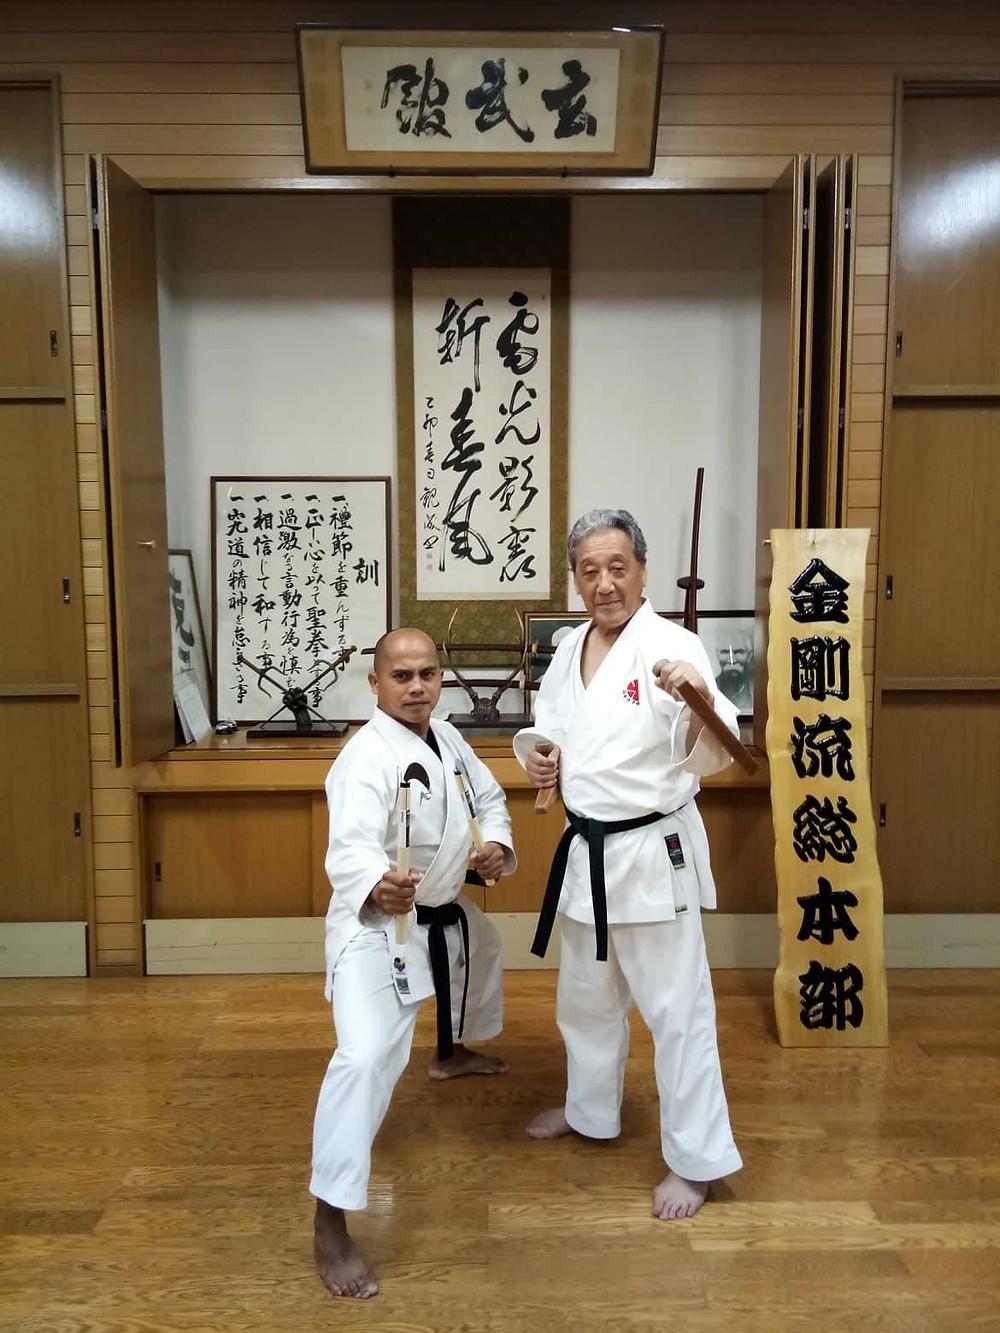 With Soke Sakagai at Itosu-kai Headquarters